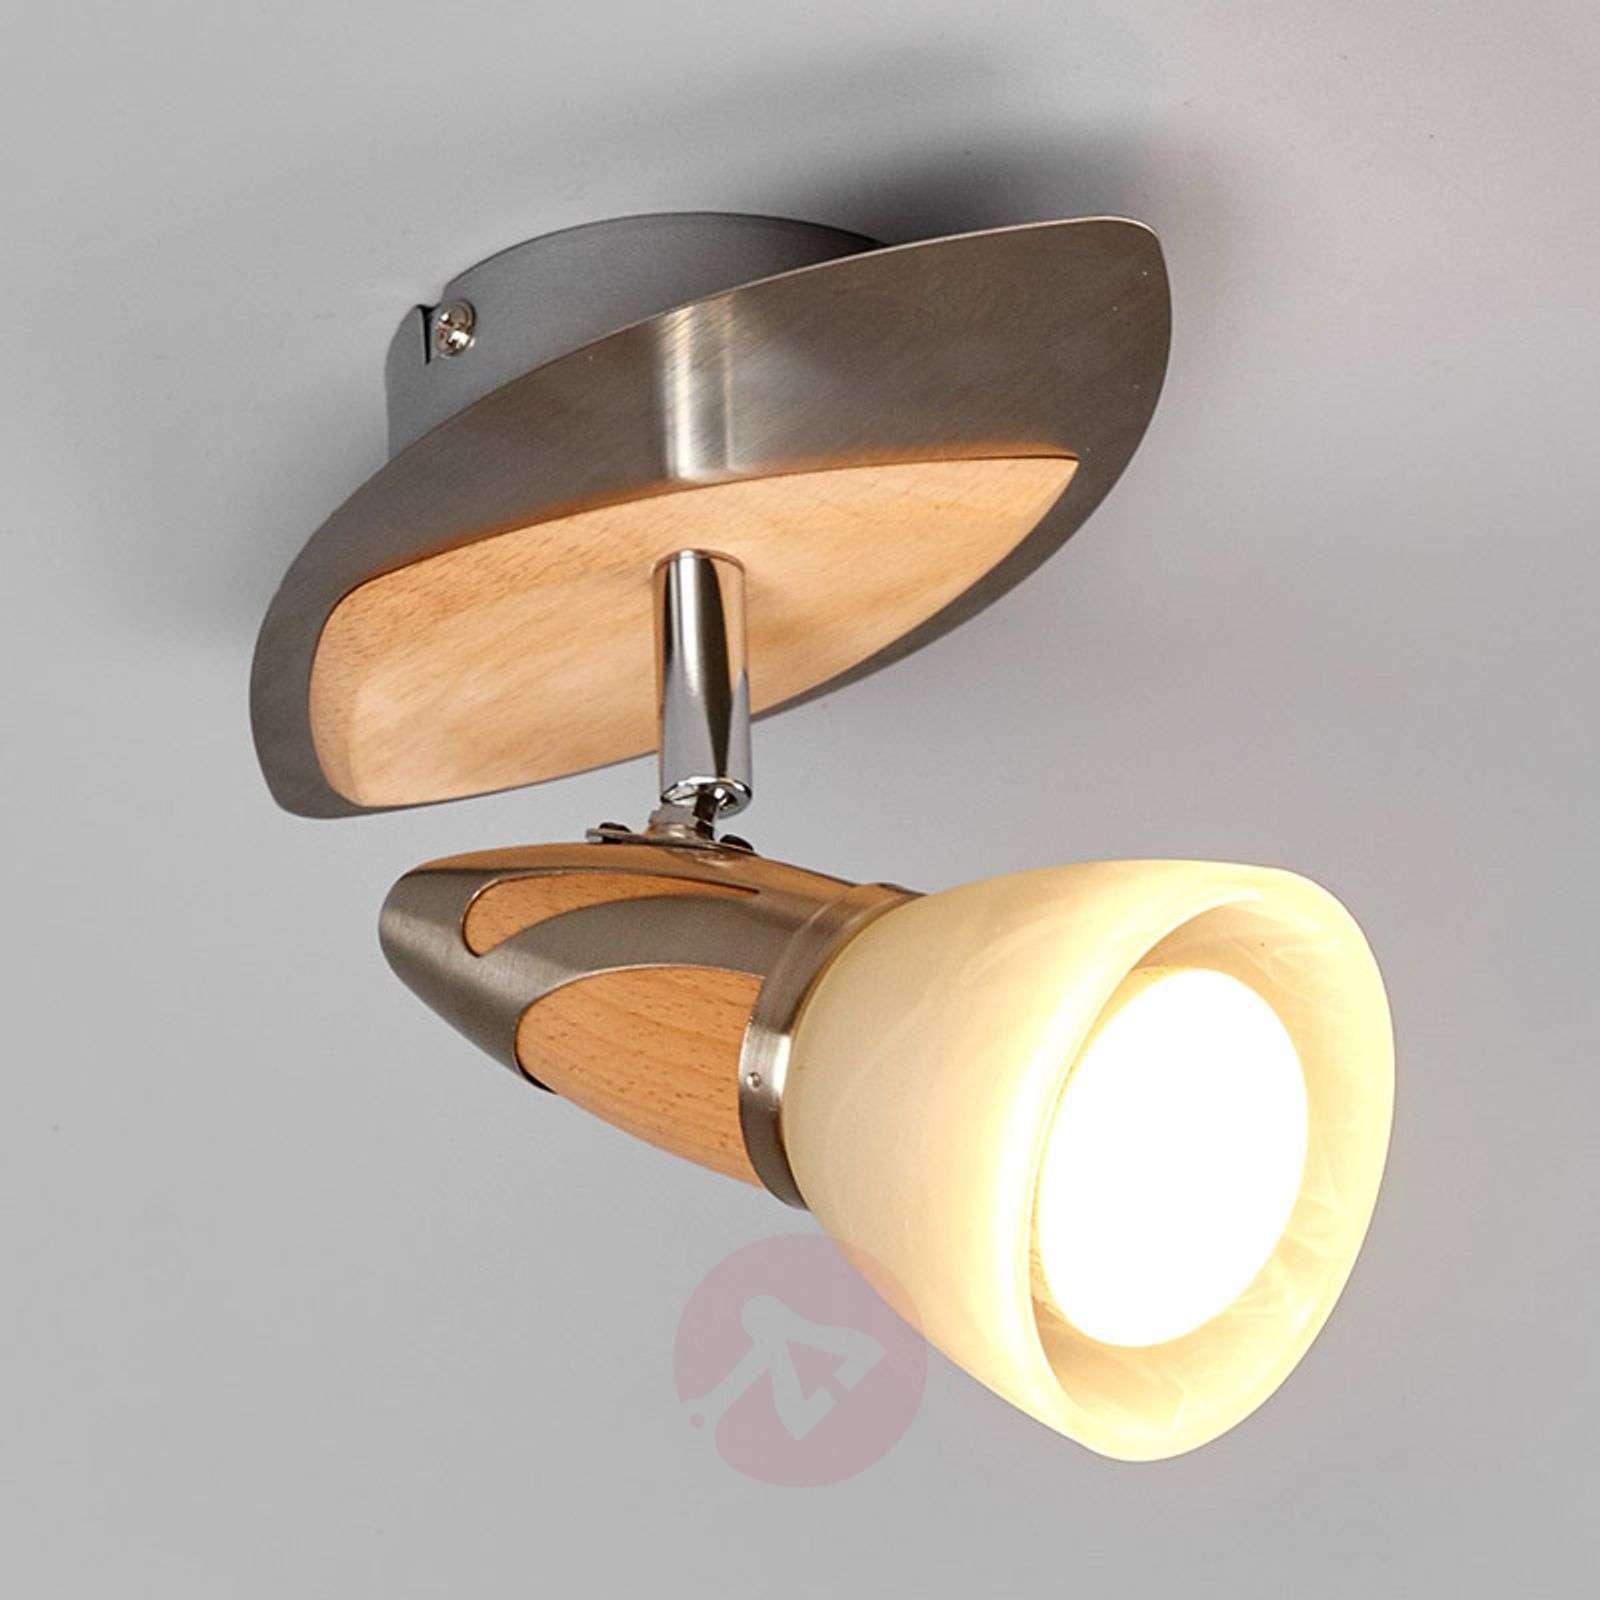 Spotti Marena, puuapplikoinnit, E14 R50 LED-9620552-01